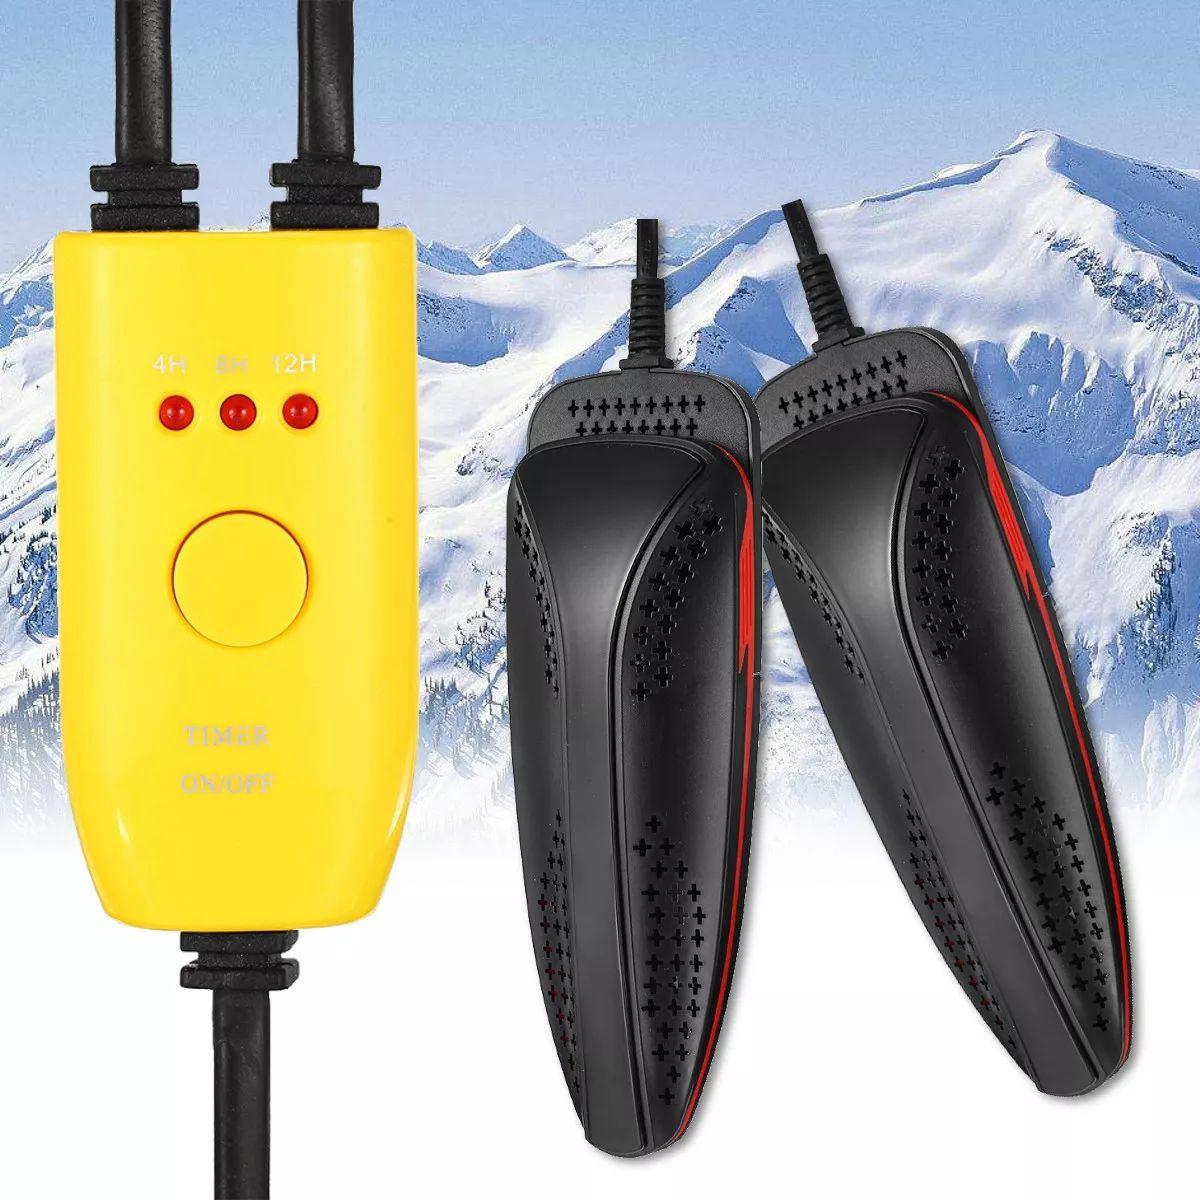 20W 110V220V Electric Shoe Dryer Foot Protector Boot Odor Deodorant Shoes Drier Heater - Yellow 220V EU Plug